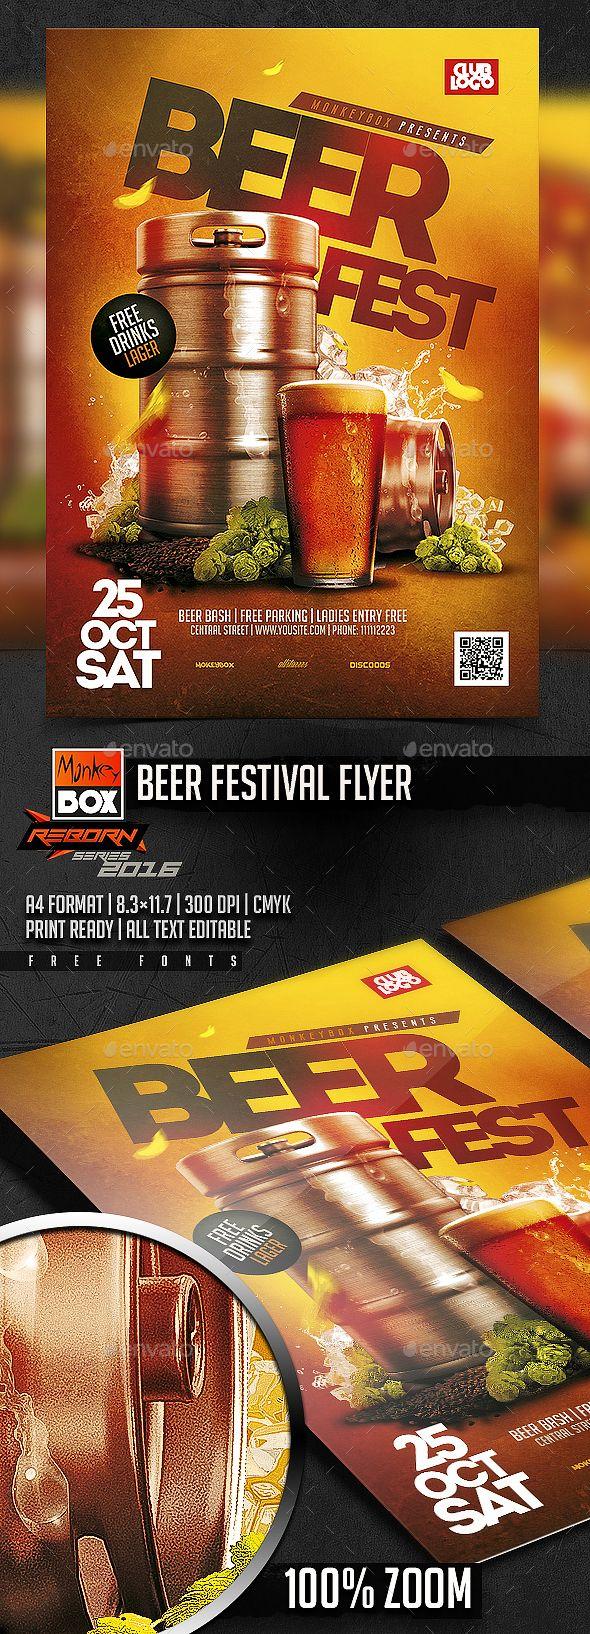 Beer Festival Flyer  — PSD Template #brew #oktober • Download ➝ https://graphicriver.net/item/beer-festival-flyer/18410760?ref=pxcr